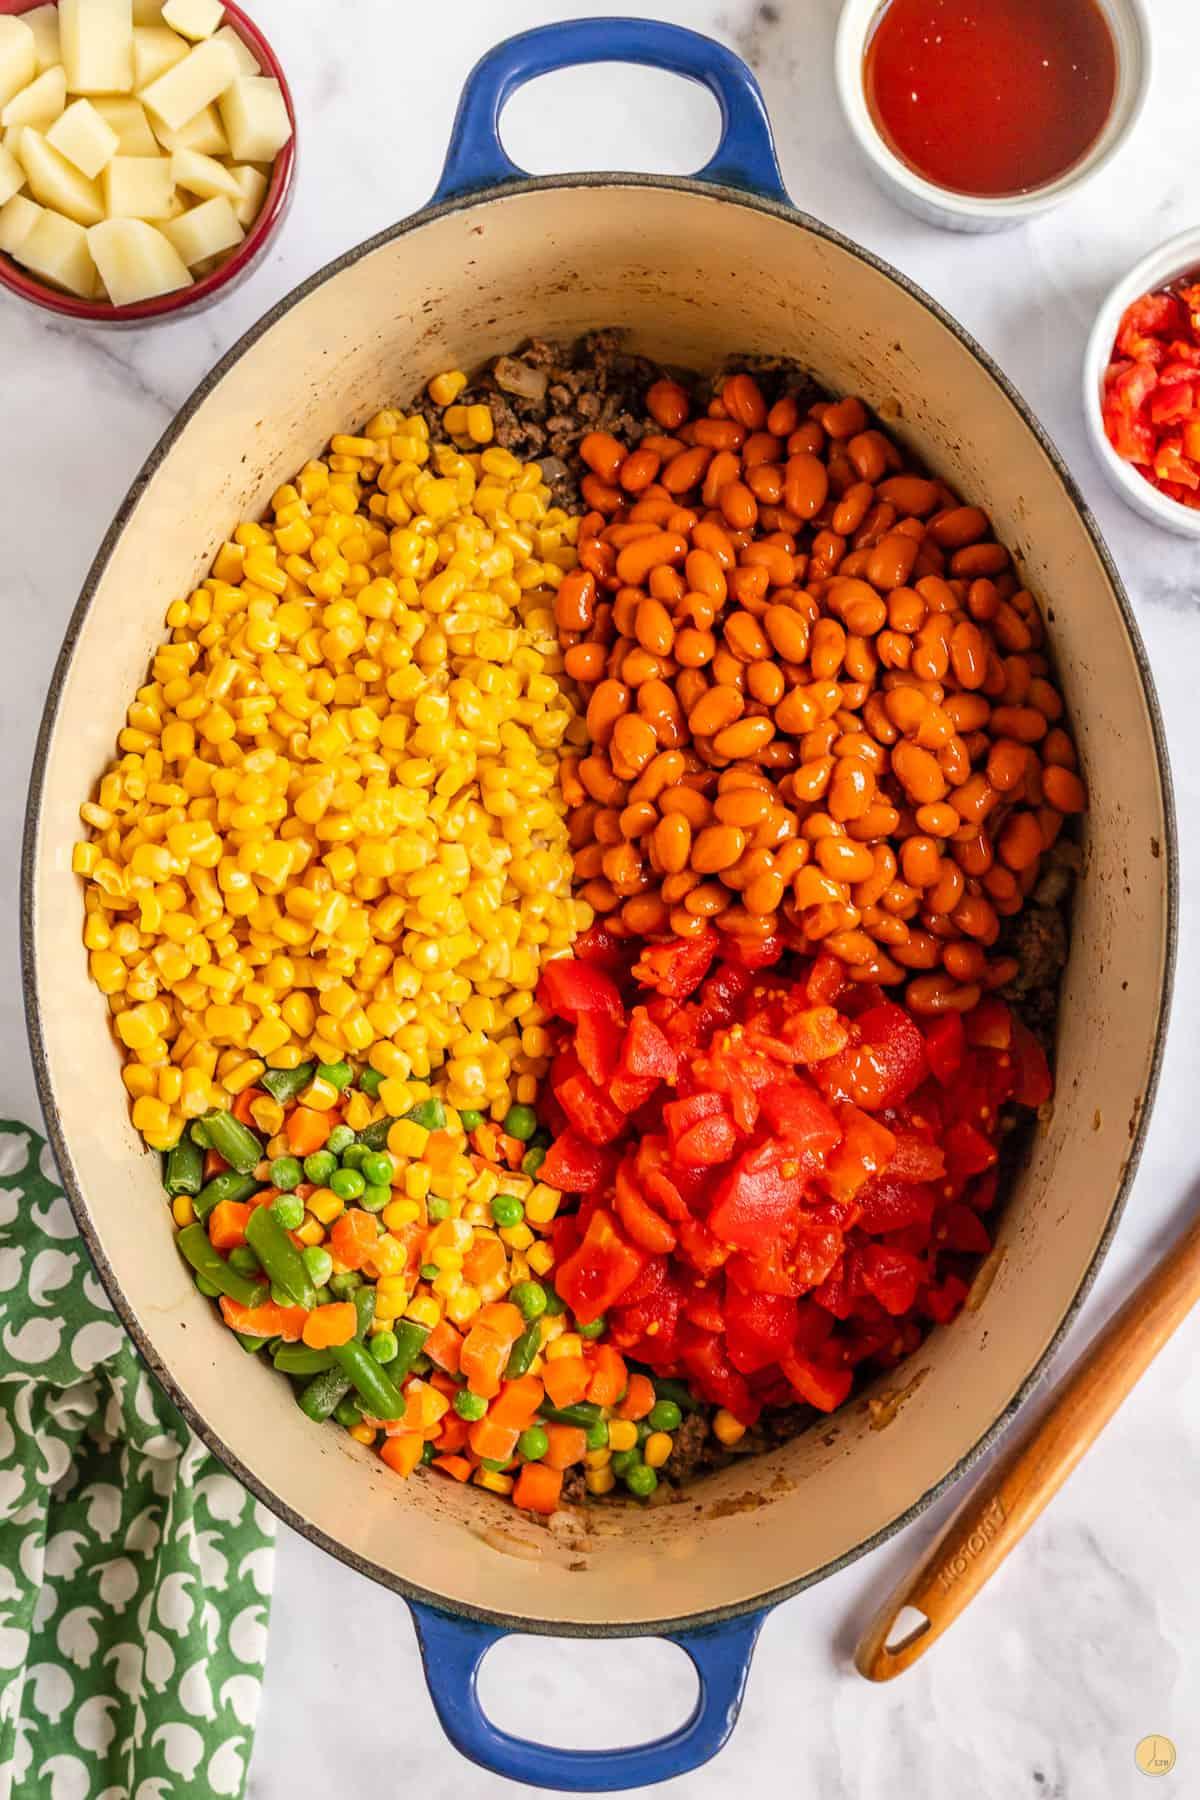 vegetables in a pot